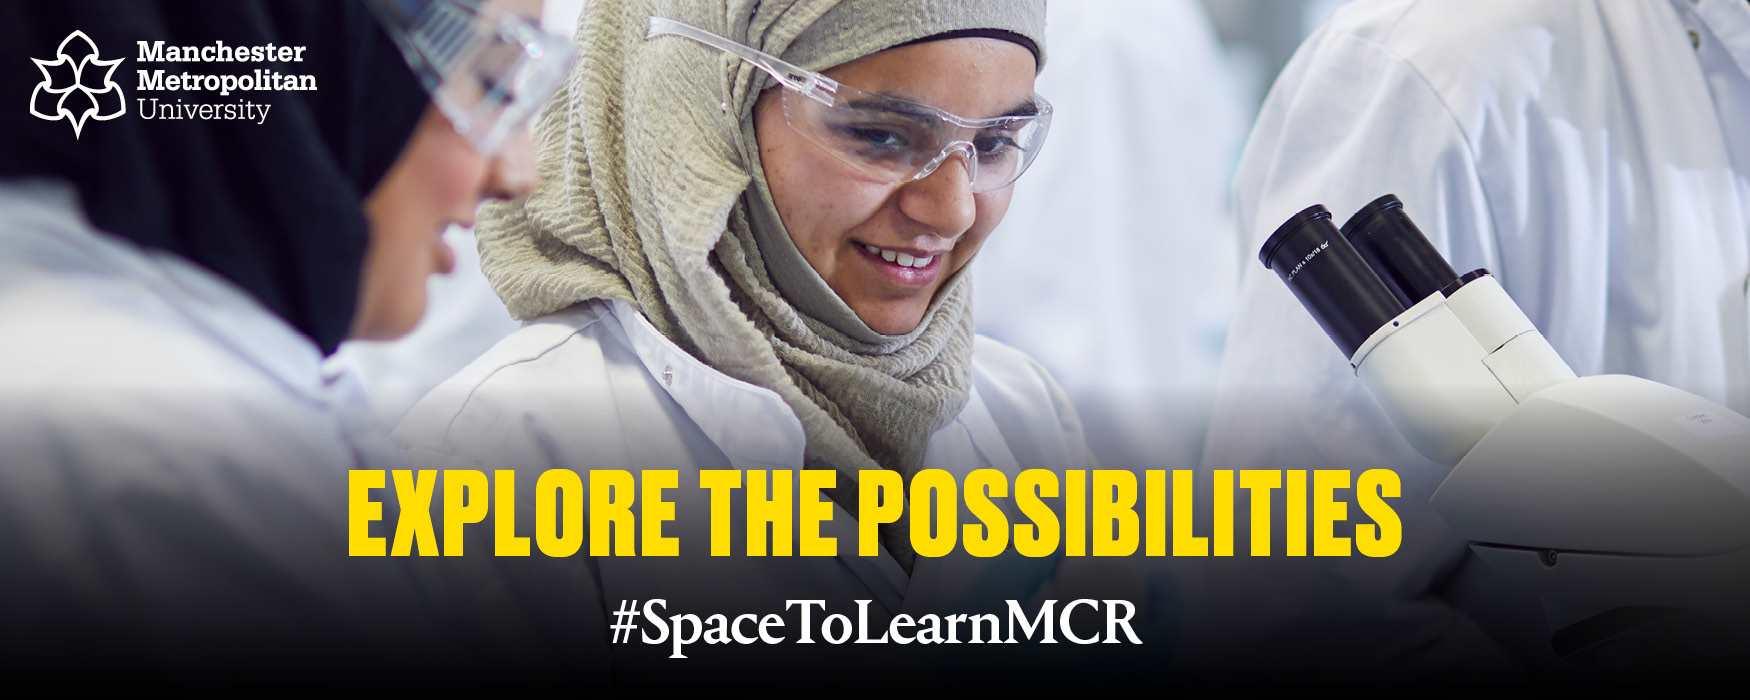 Manchester Metropolitan University Campaign Banner